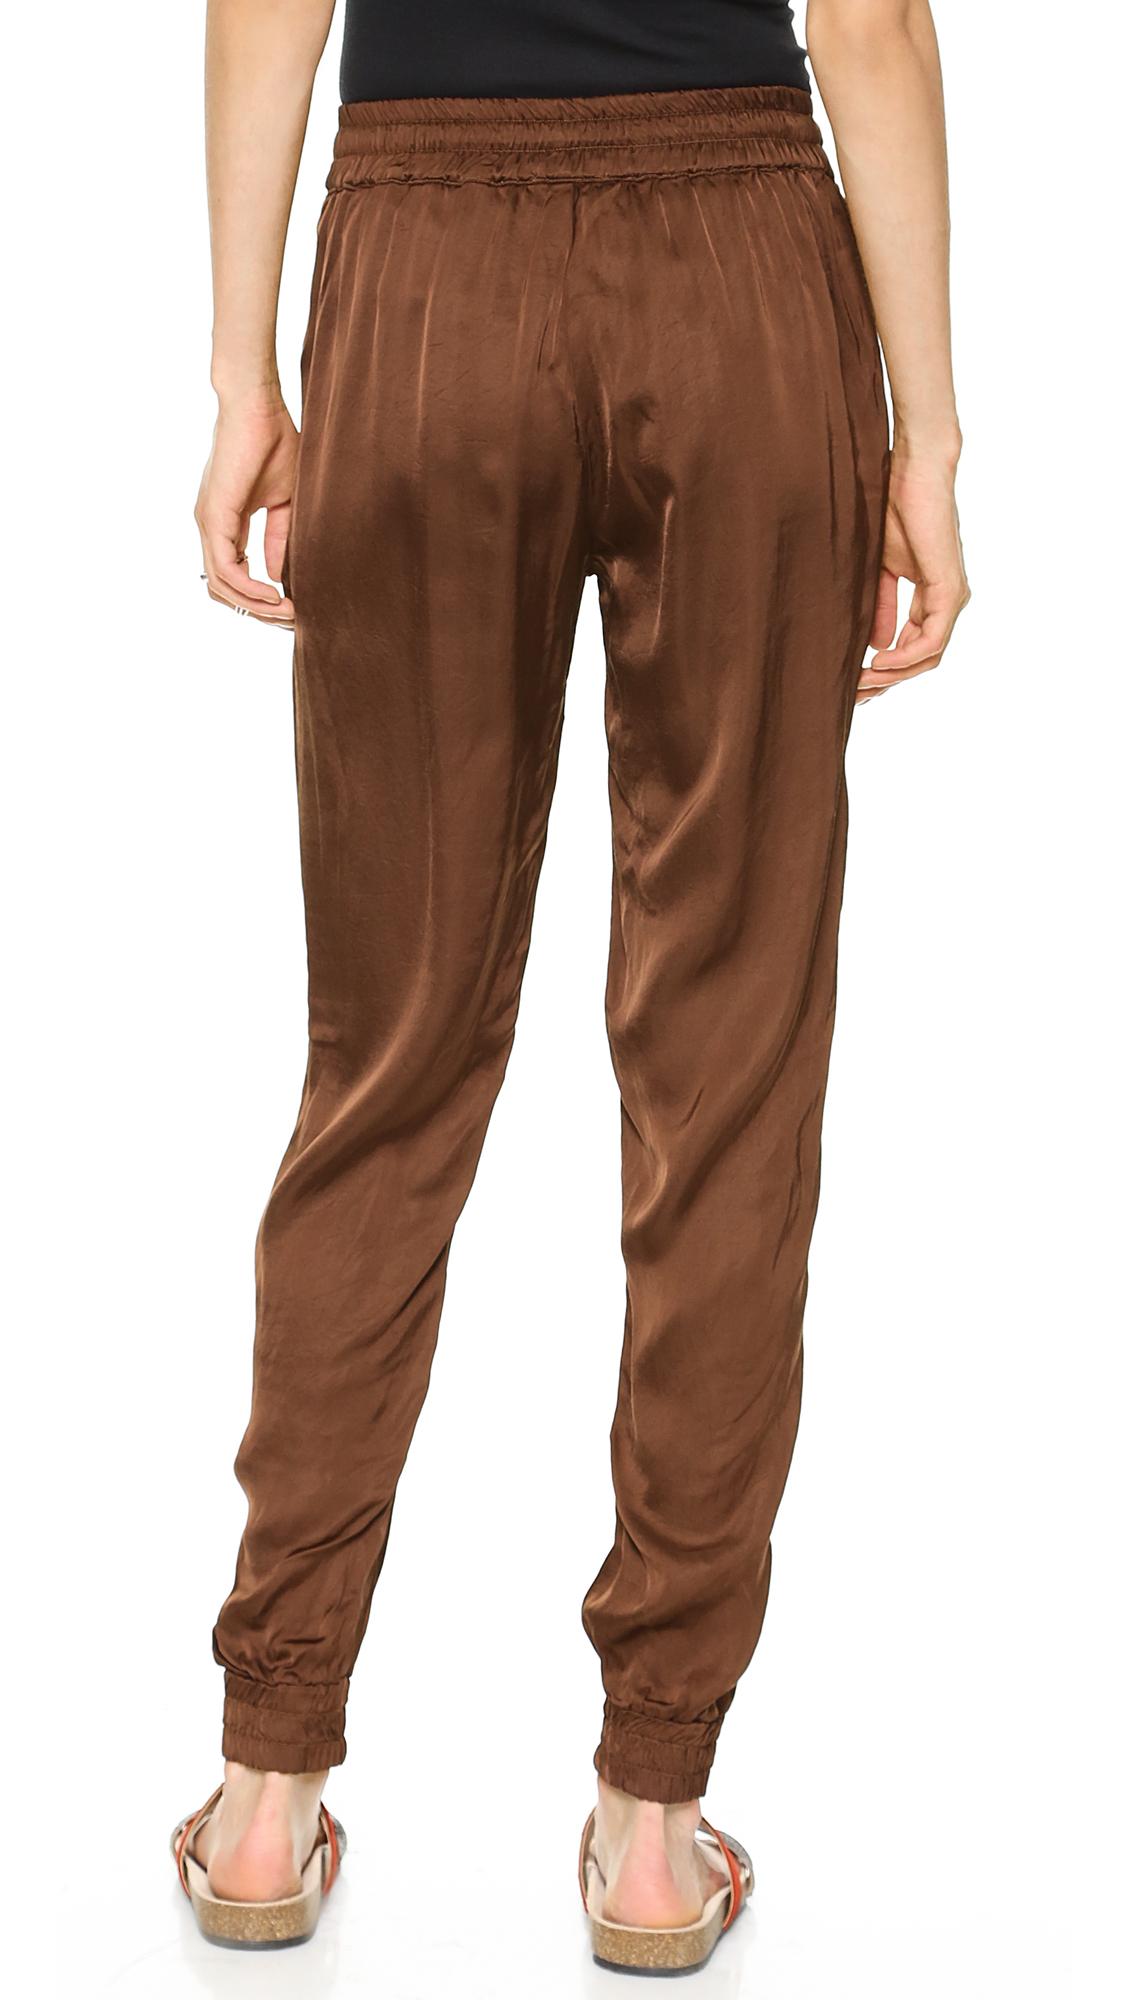 Clu sweatpants